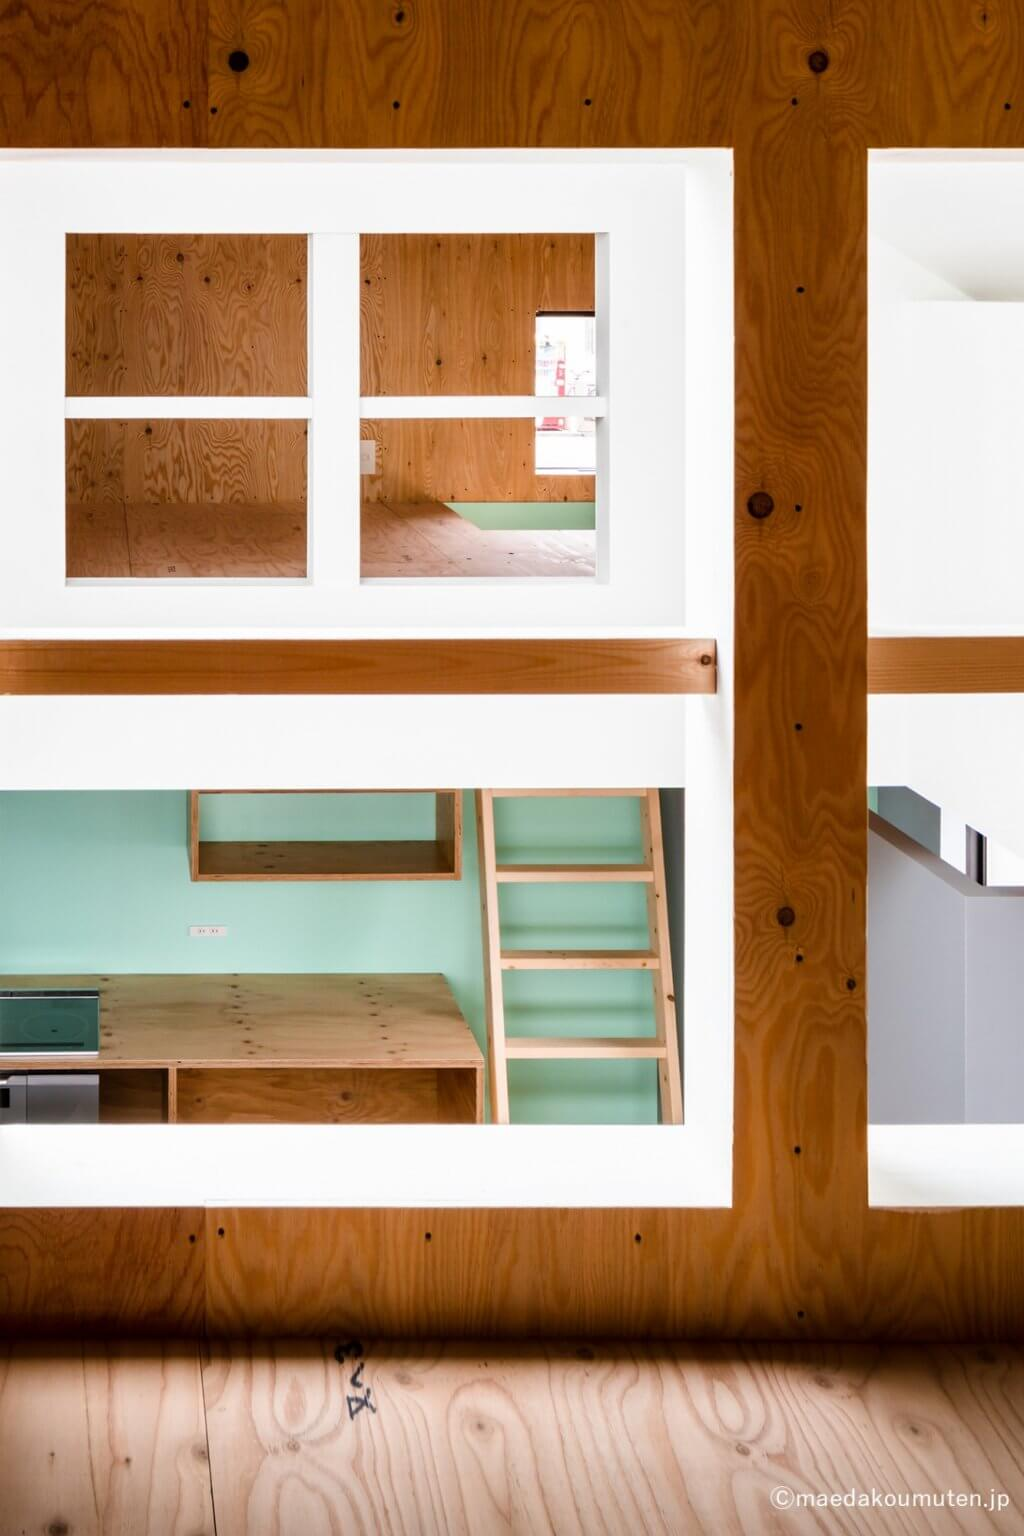 神奈川、工務店、注文住宅、デザイン住宅、建築家、磯部の家、30